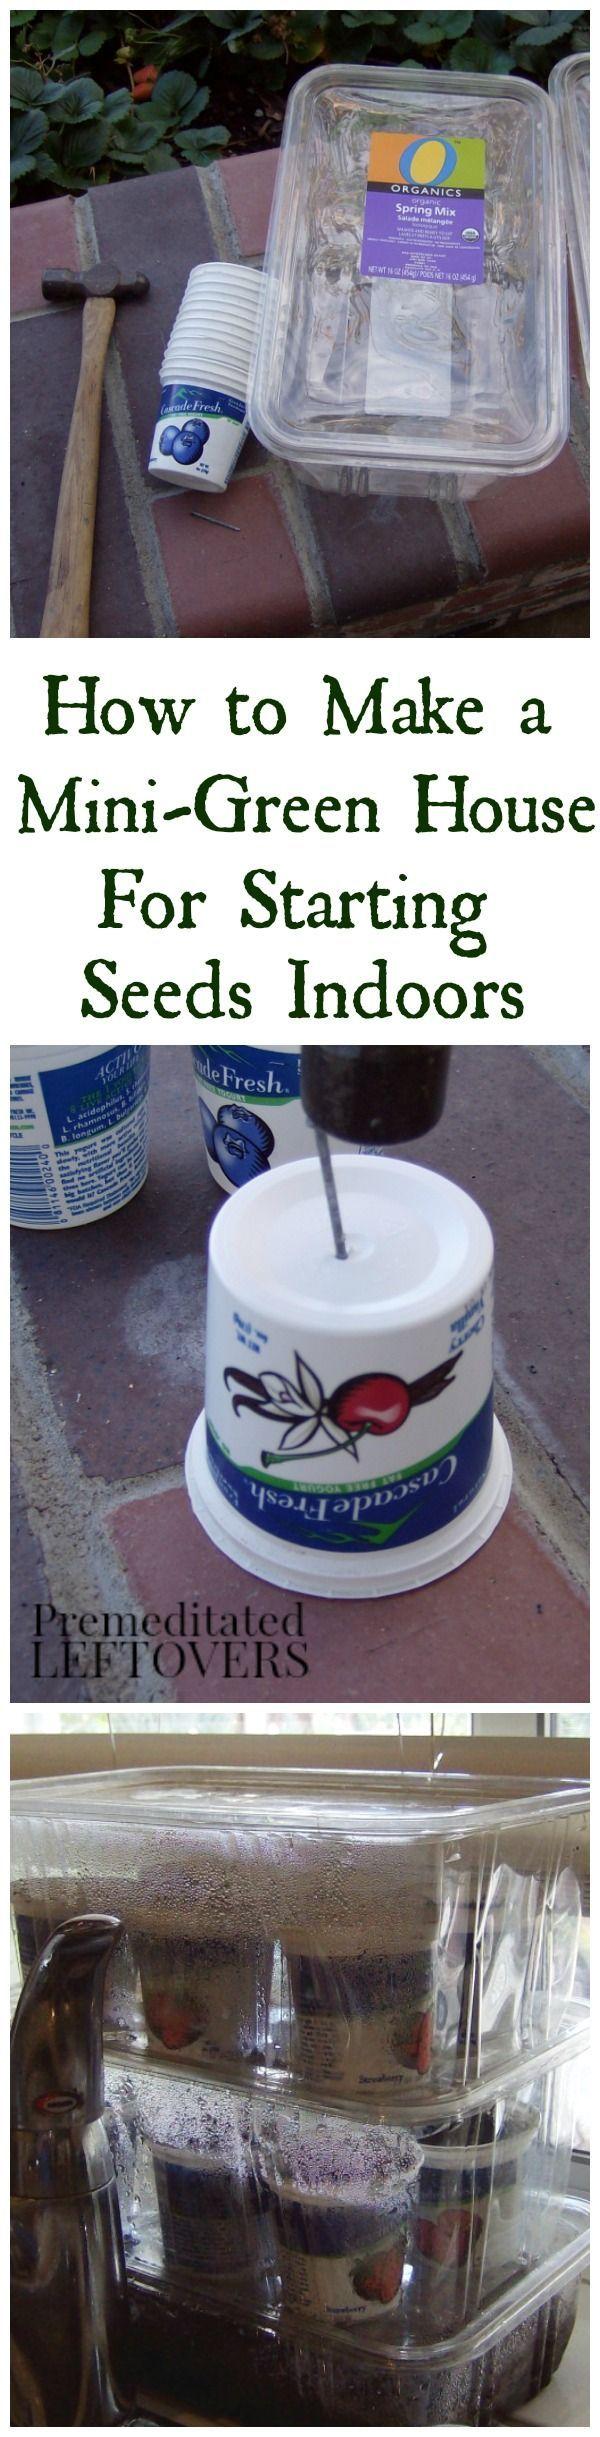 Best 25+ Mini Greenhouse Ideas On Pinterest  Portable Greenhouse, Small  Greenhouse And Diy Greenhouse